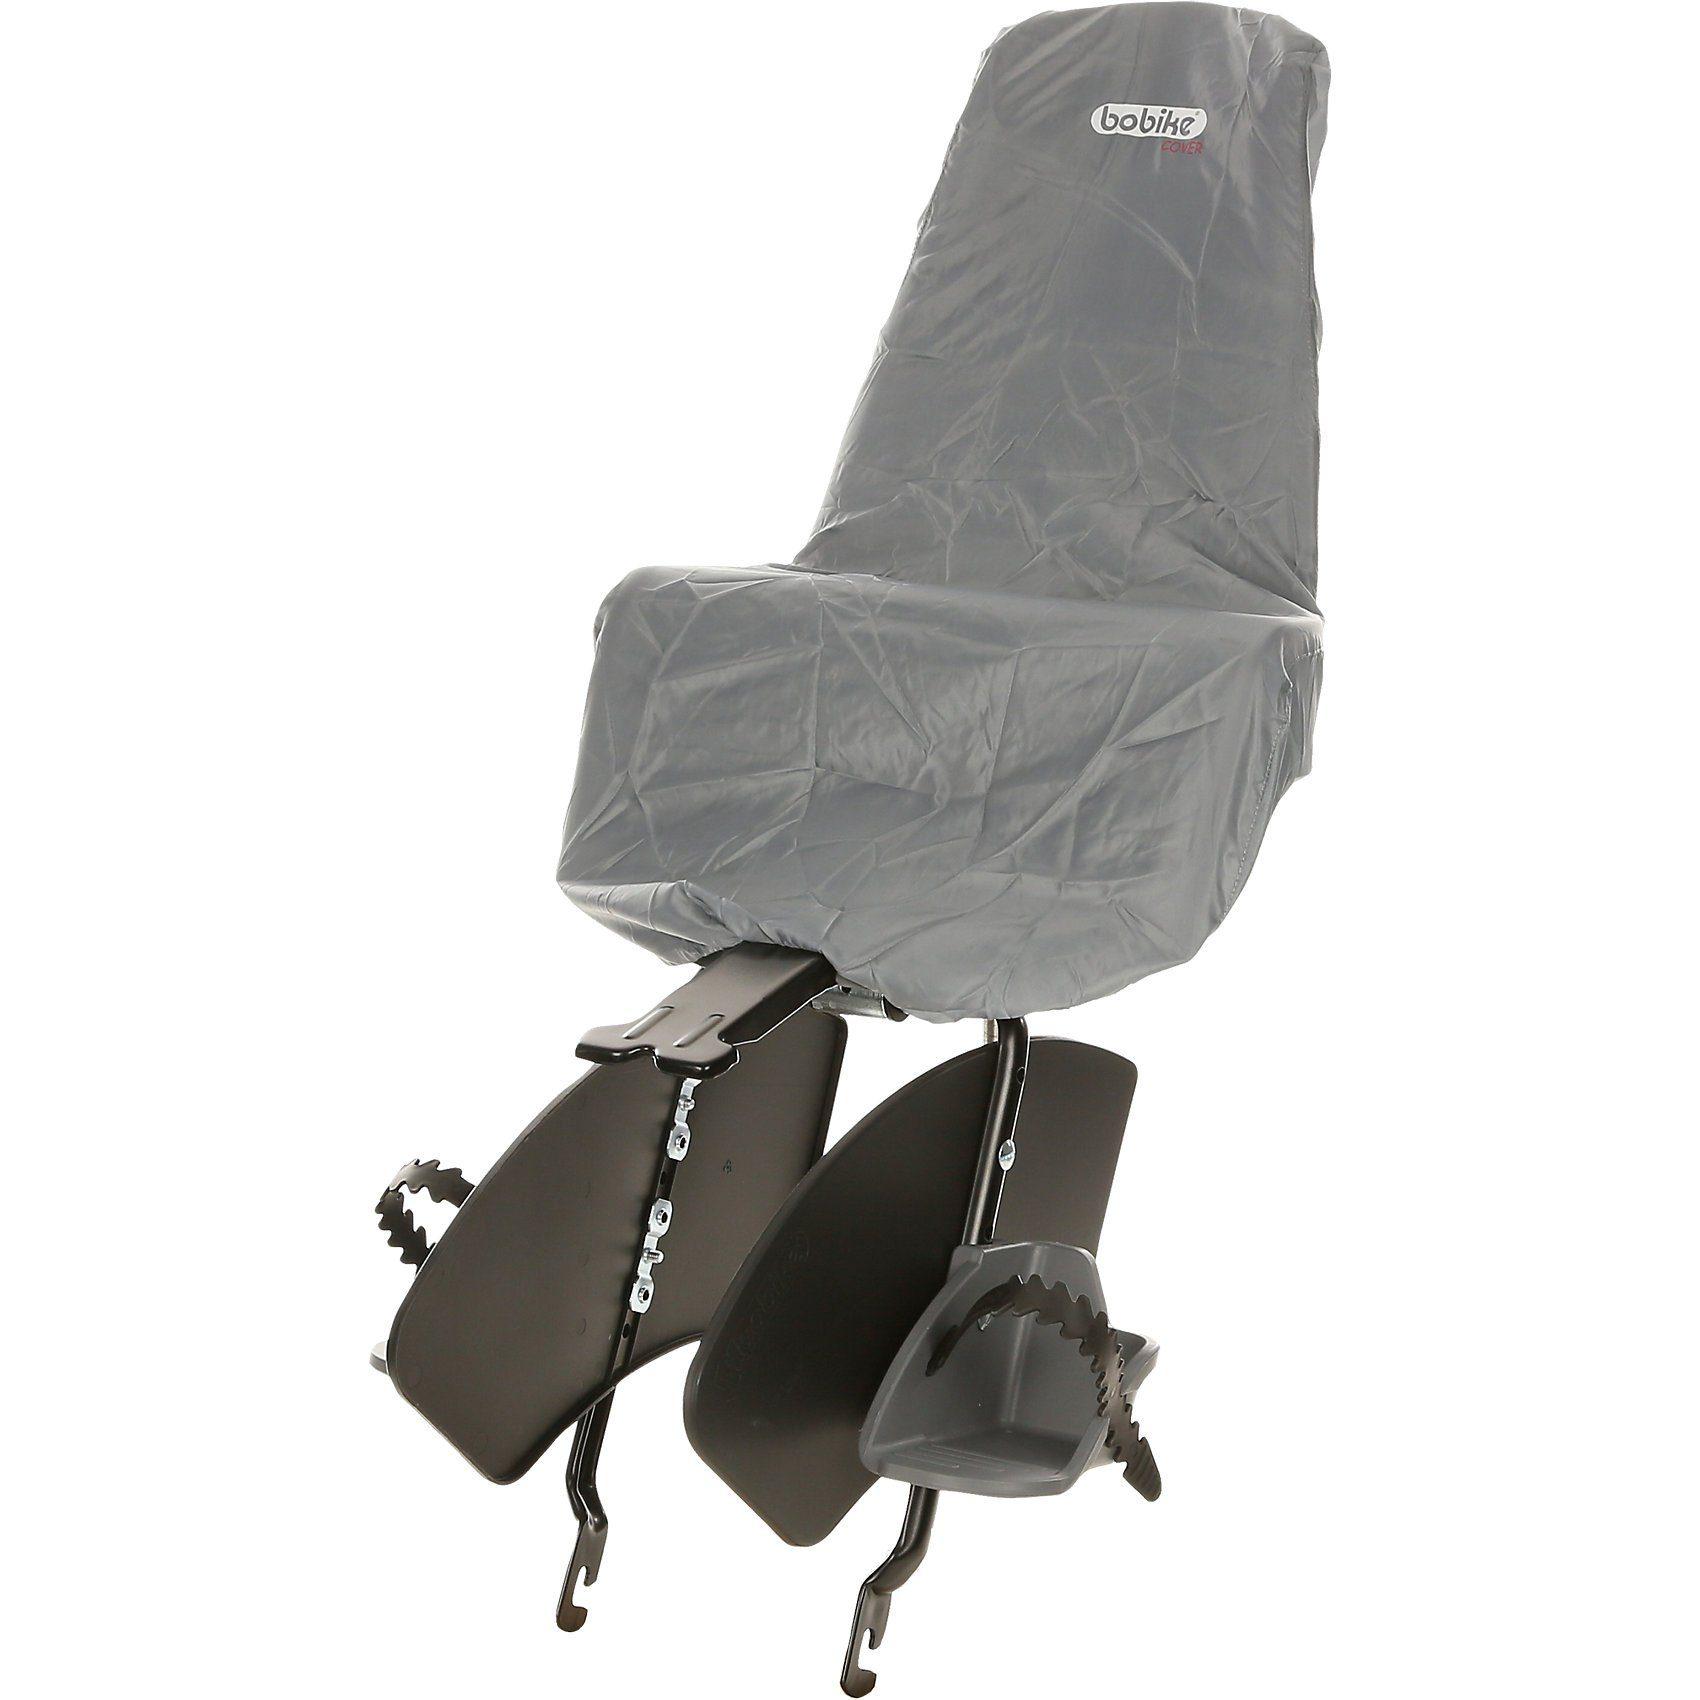 bobike Regenschutz für Mini EXCLUSIVE, Maxi ONE, Maxi CLASSIC und J